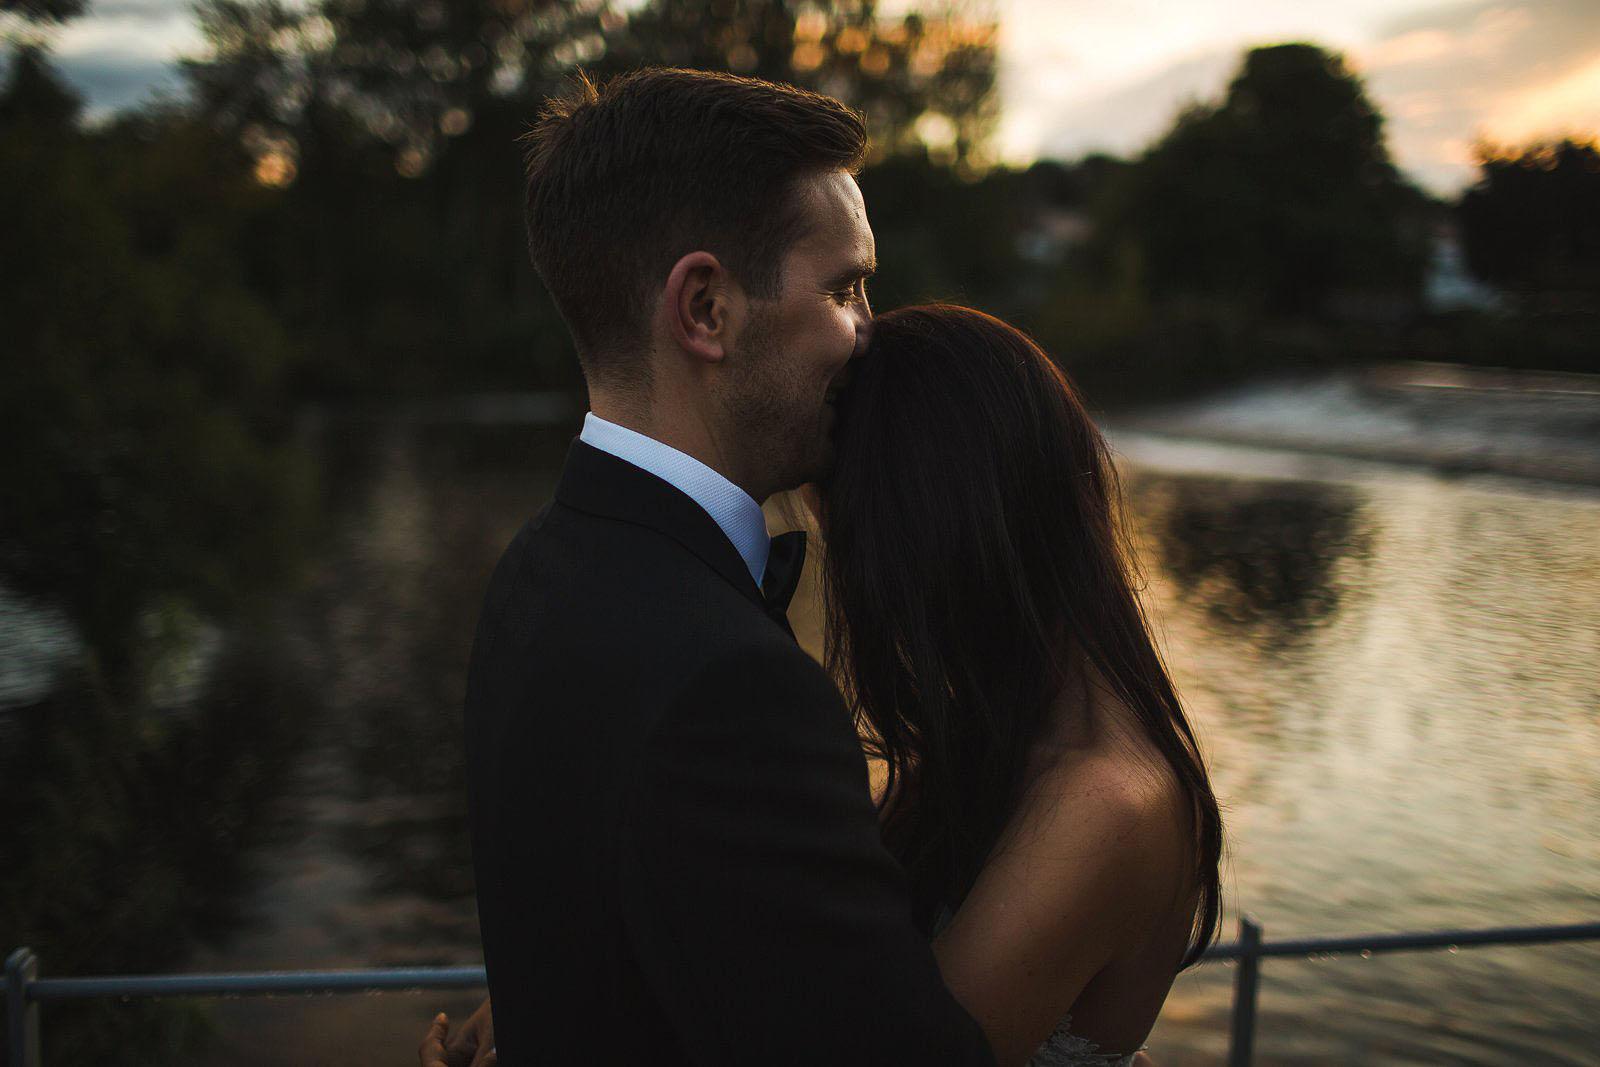 Sheffield contemporary wedding photographer